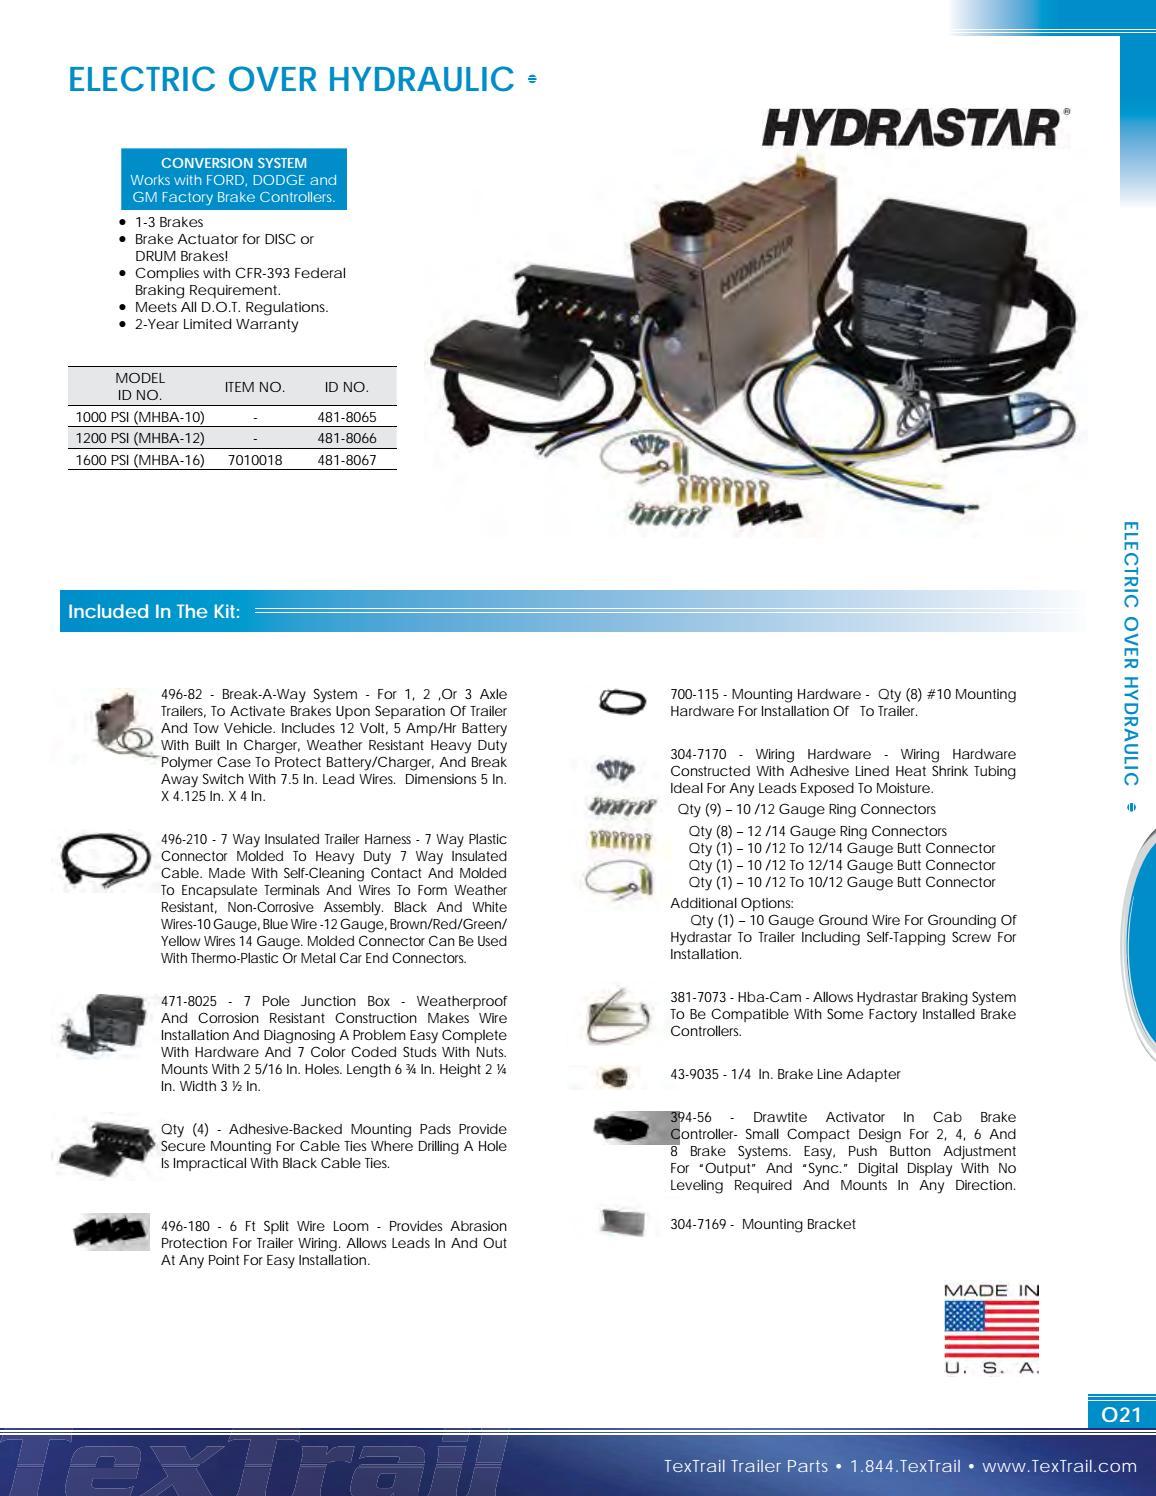 Groovy Textrail Trailer Parts Catalog By Big Tex Trailers Issuu Wiring Digital Resources Indicompassionincorg